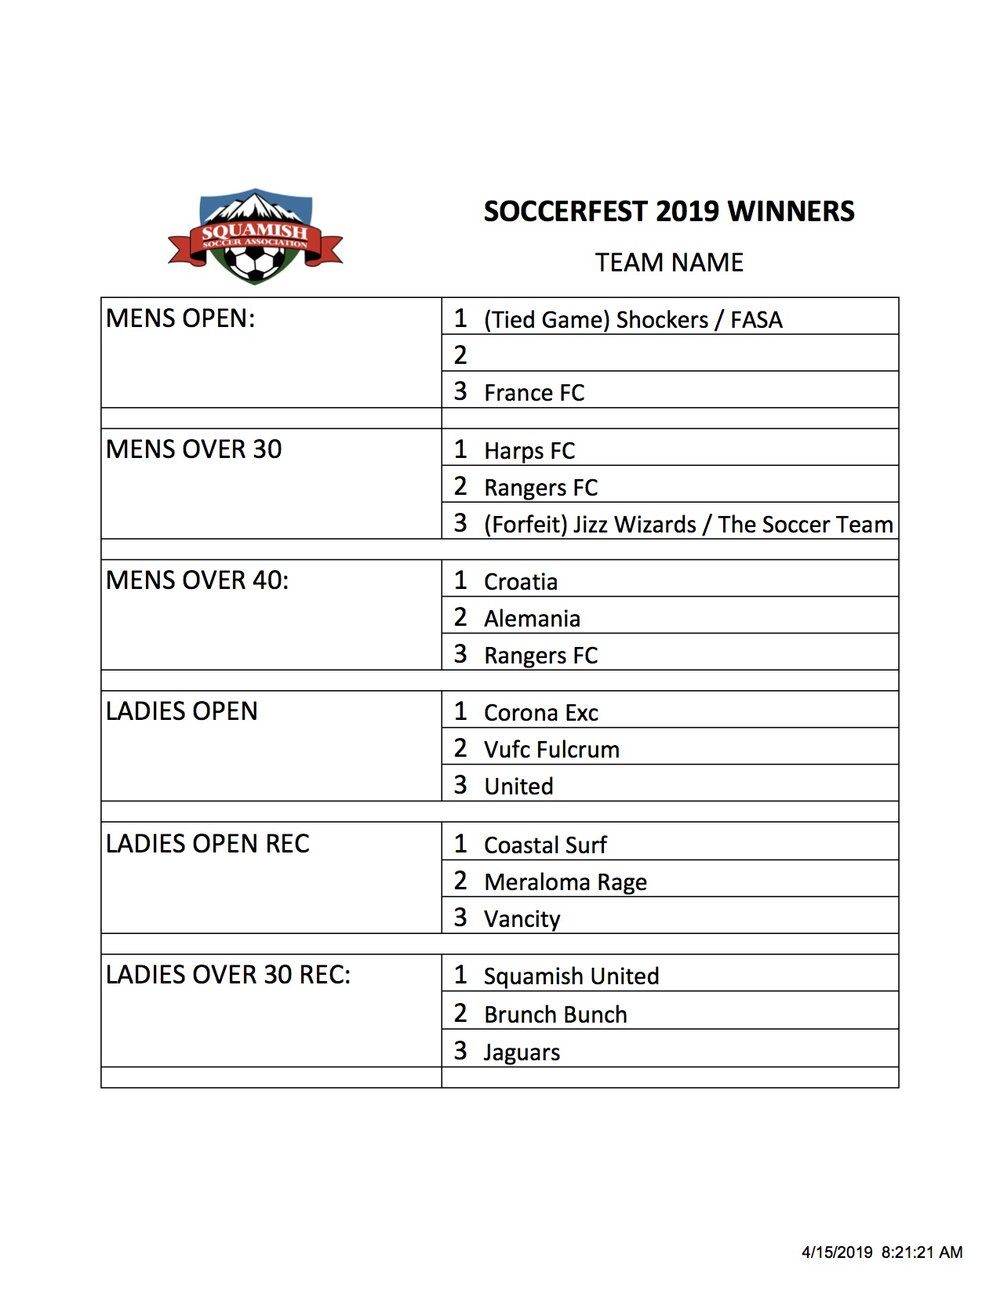 2019 Winners List.jpg